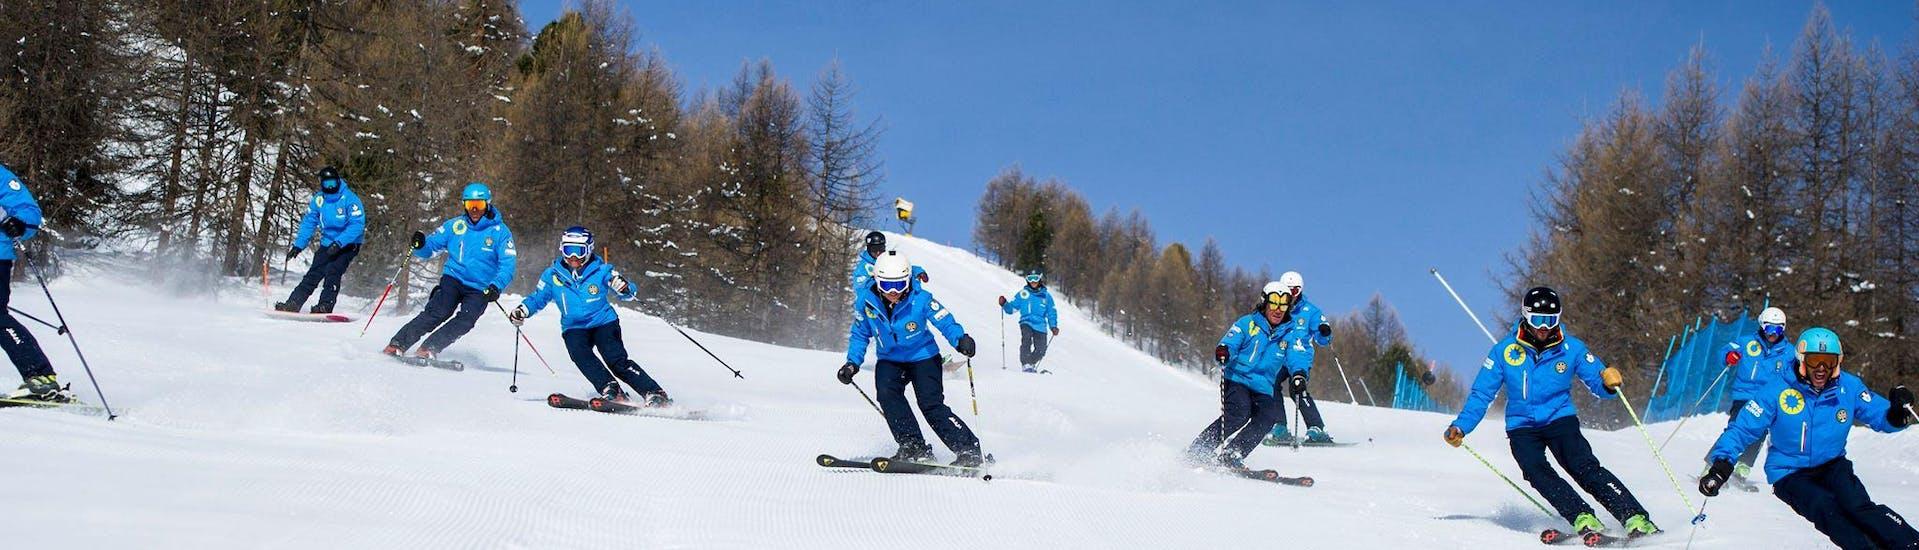 A group of ski instructors from the ski school Scuola di Sci Azzurra Livigno are collectively skiing down a ski slope in Livigno, all wearing their uniform.